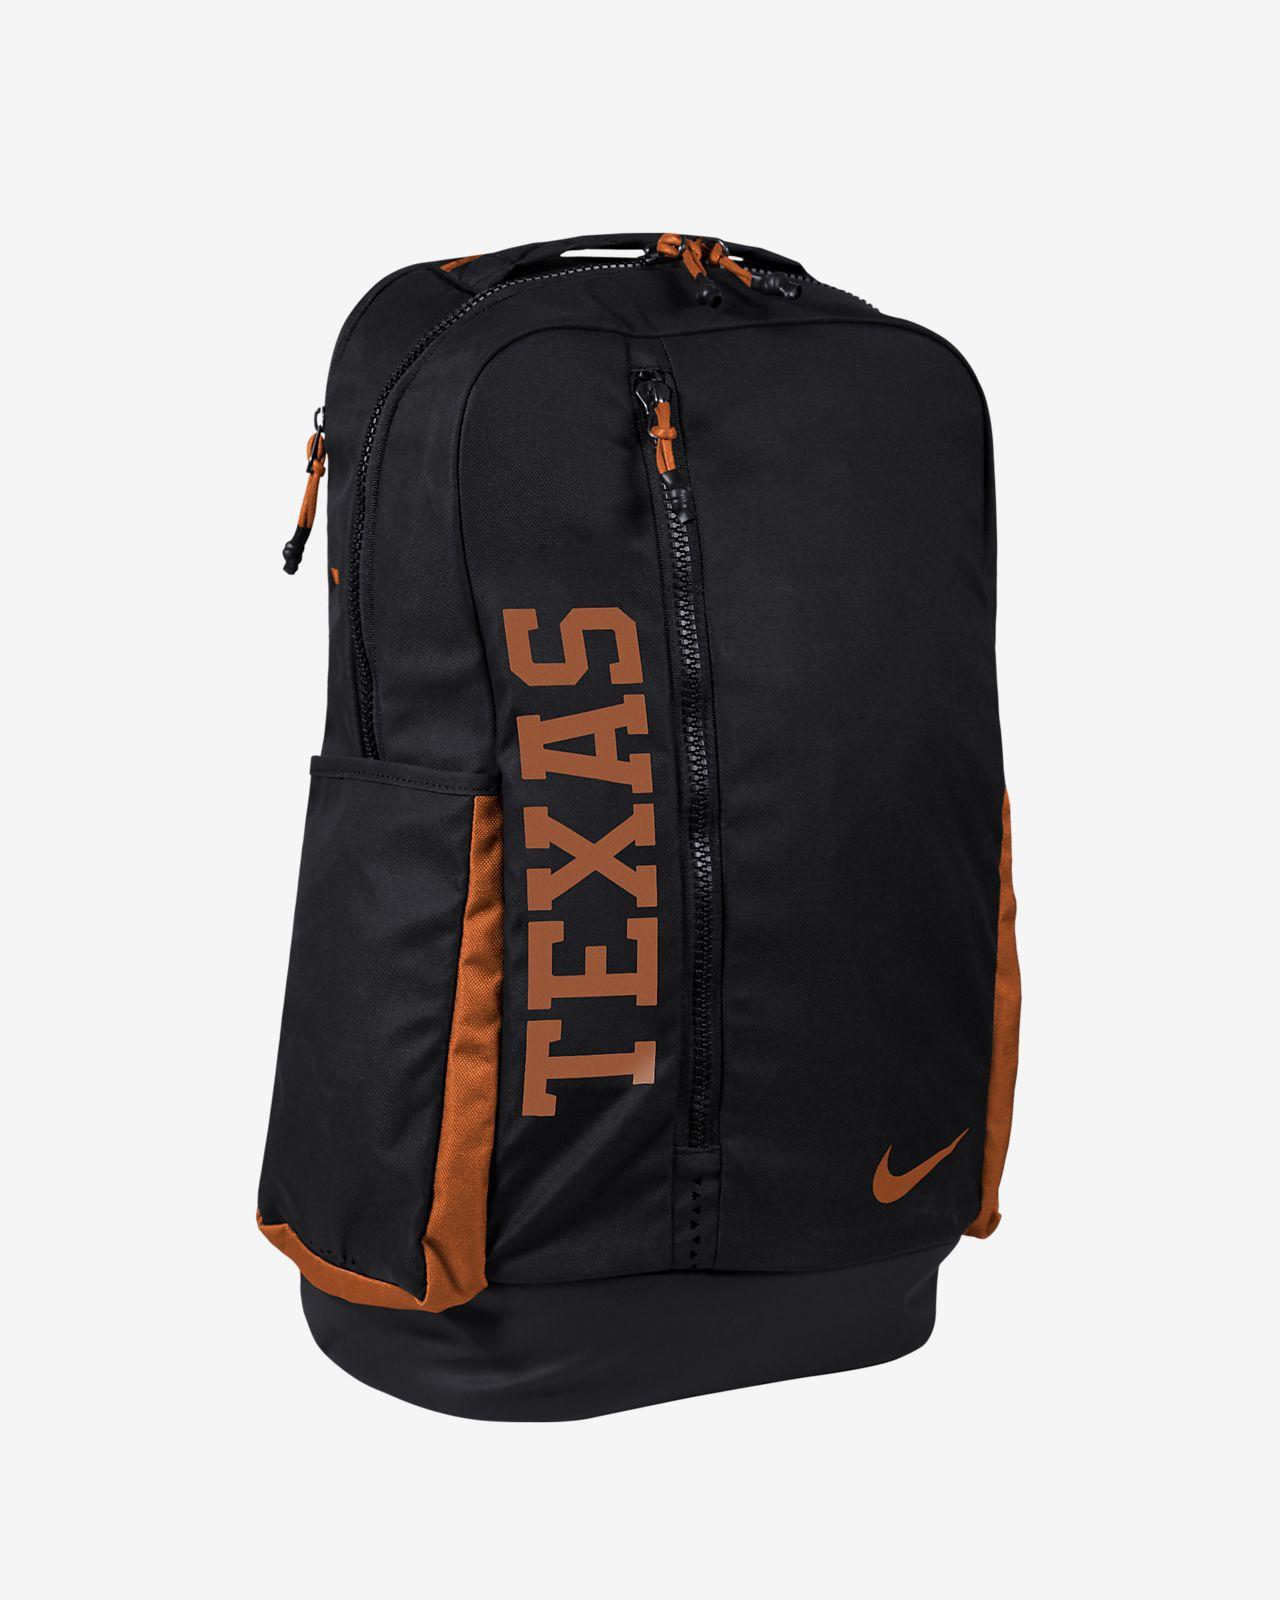 Nike College Vapor Power 2.0 (Texas) Training Backpack